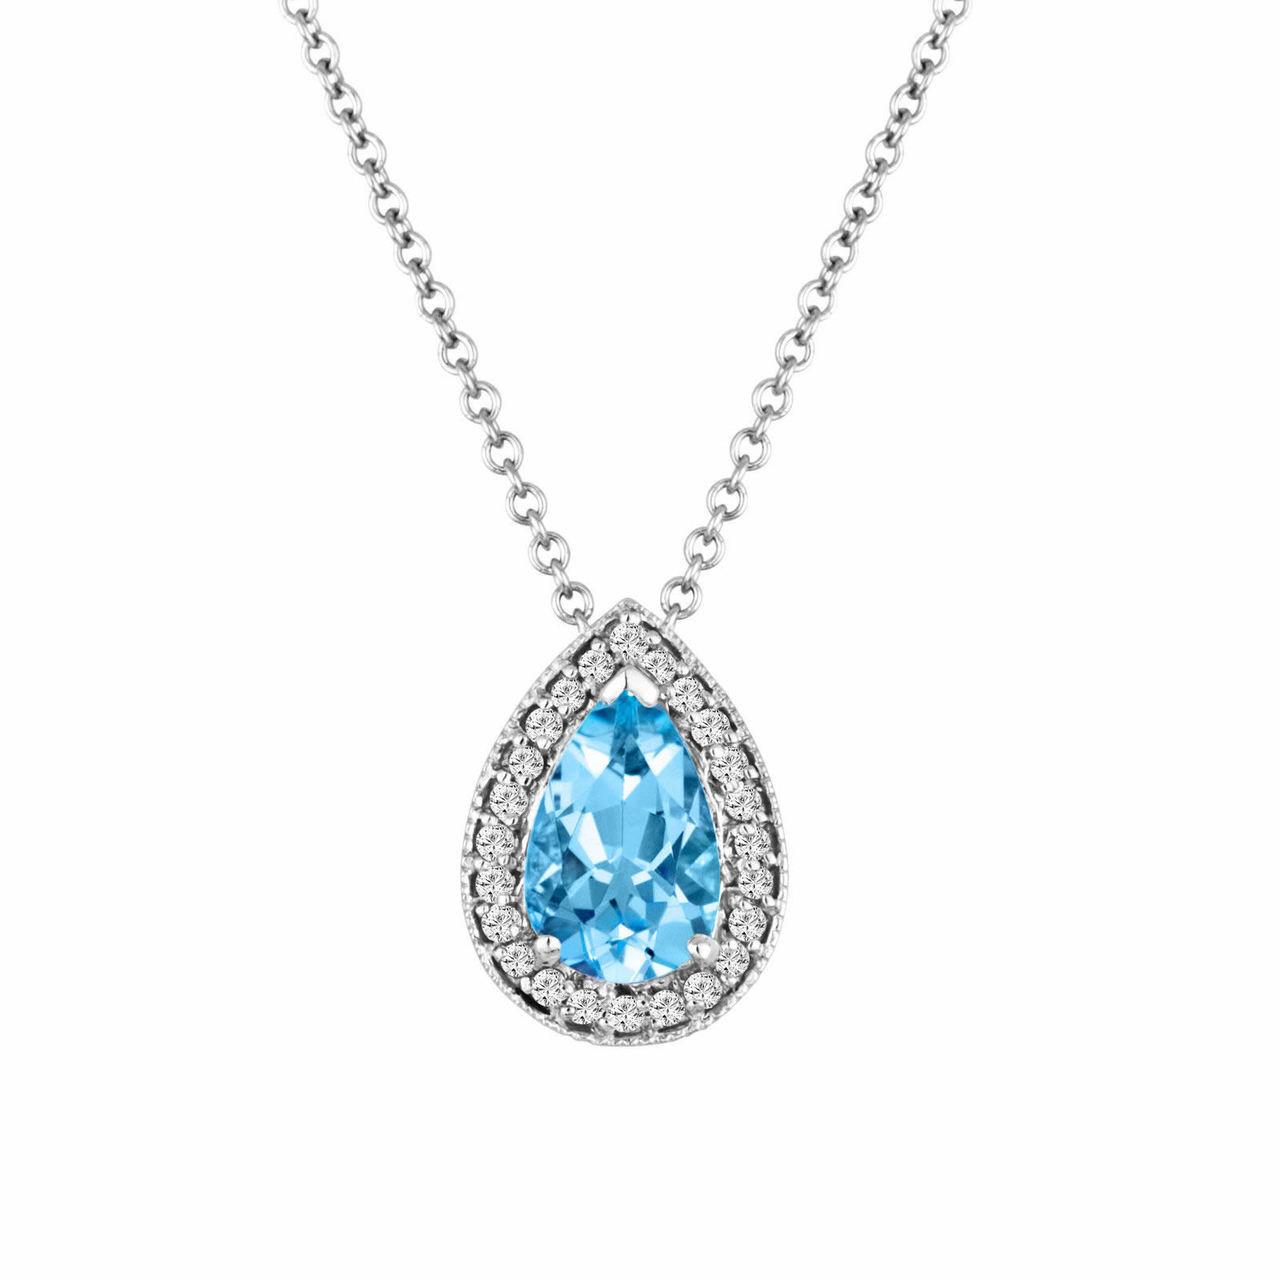 Carat Pear Shaped Diamond Pendant